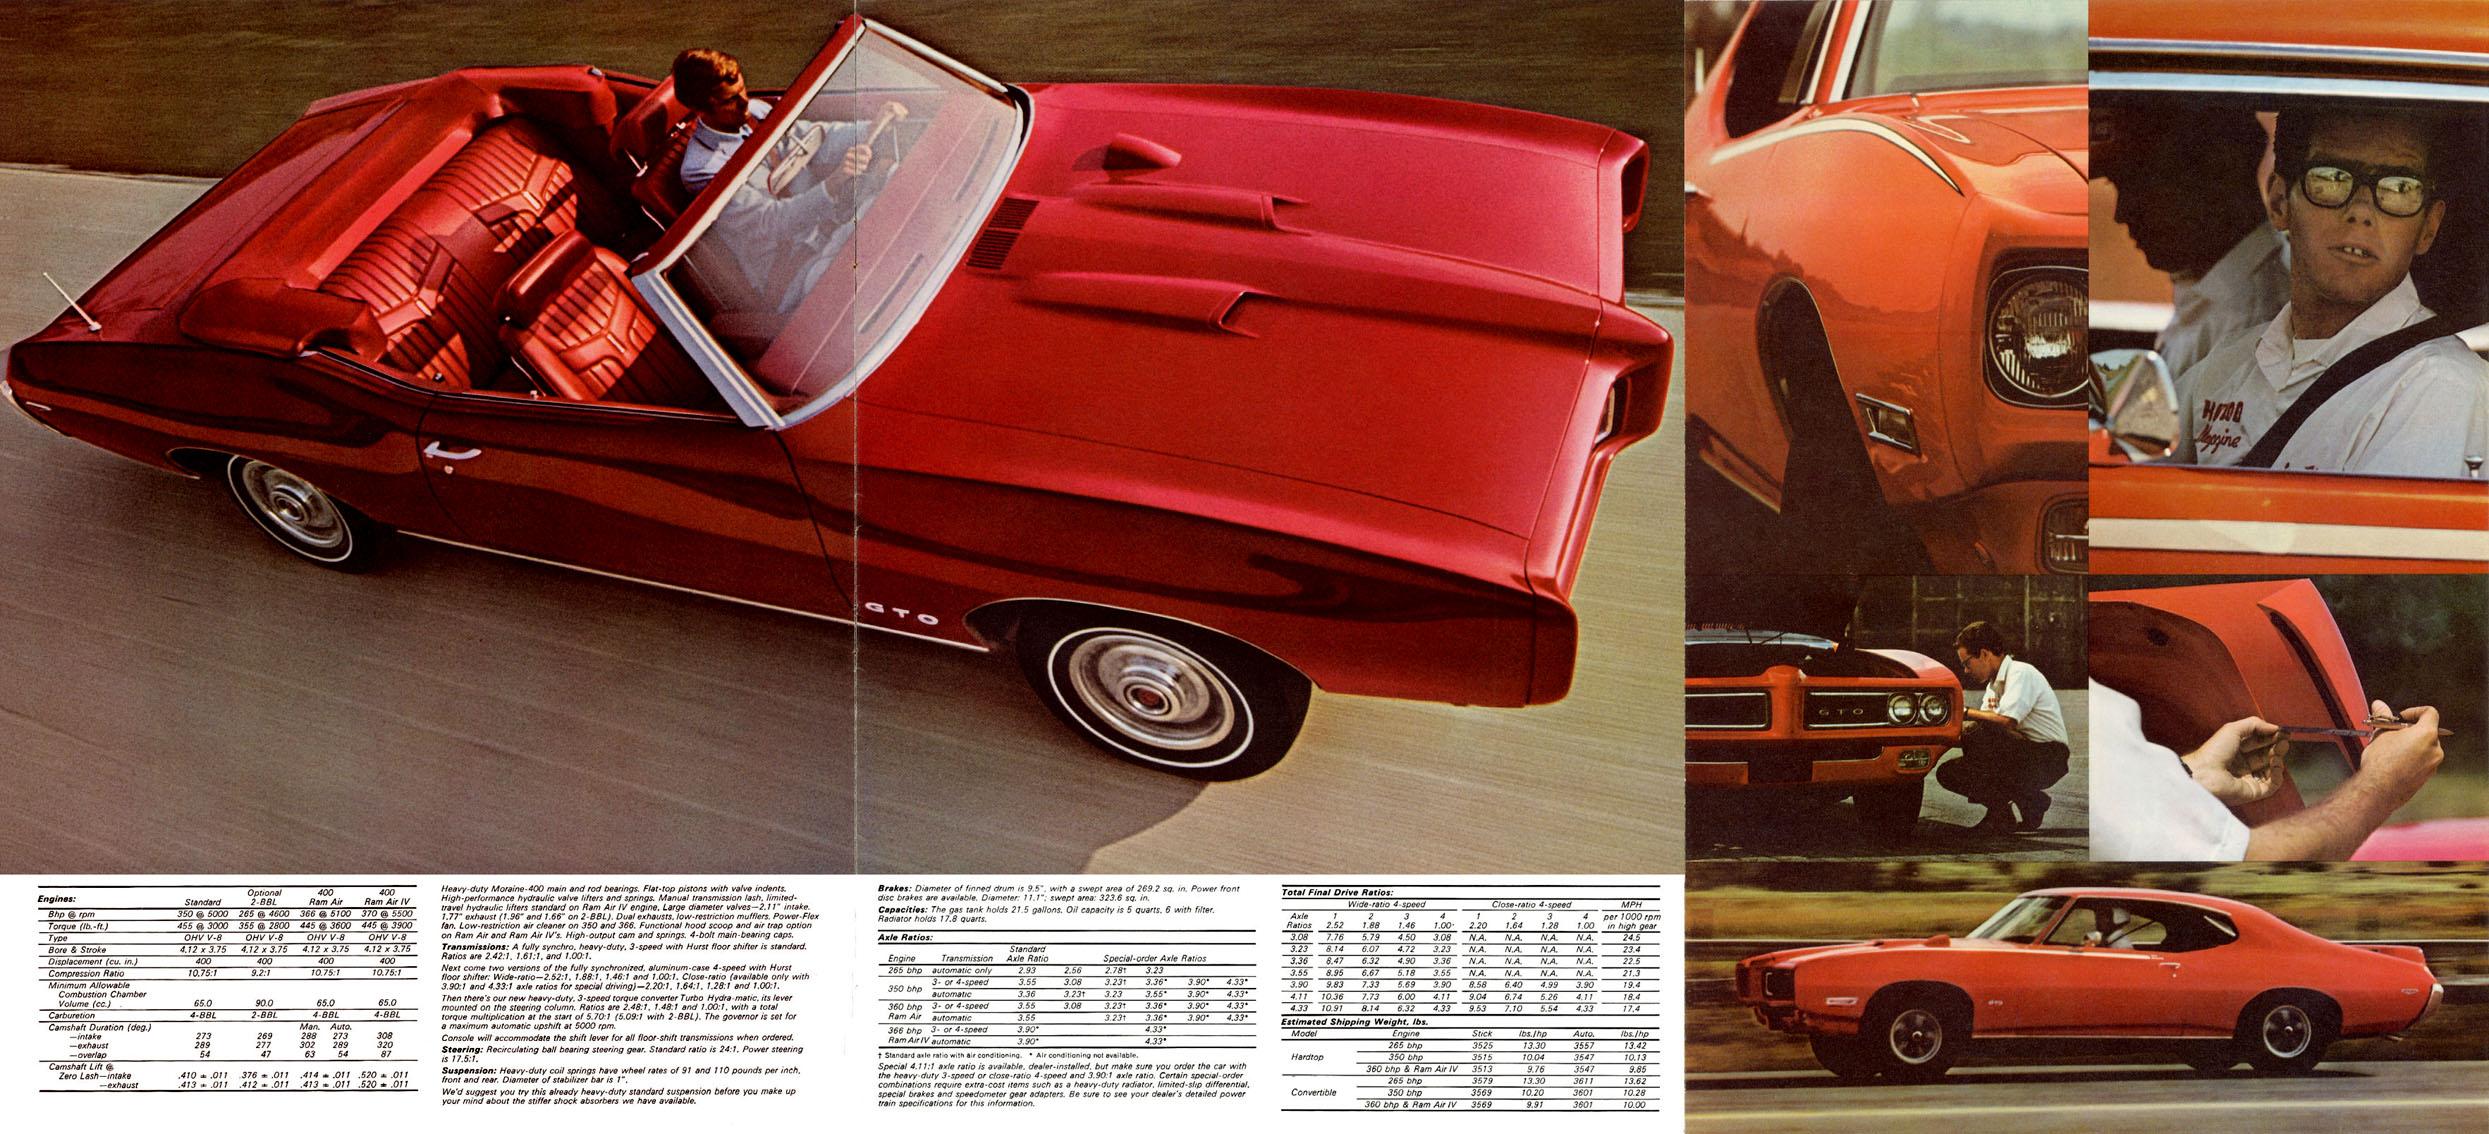 TunnelRam_GTO (41).jpg